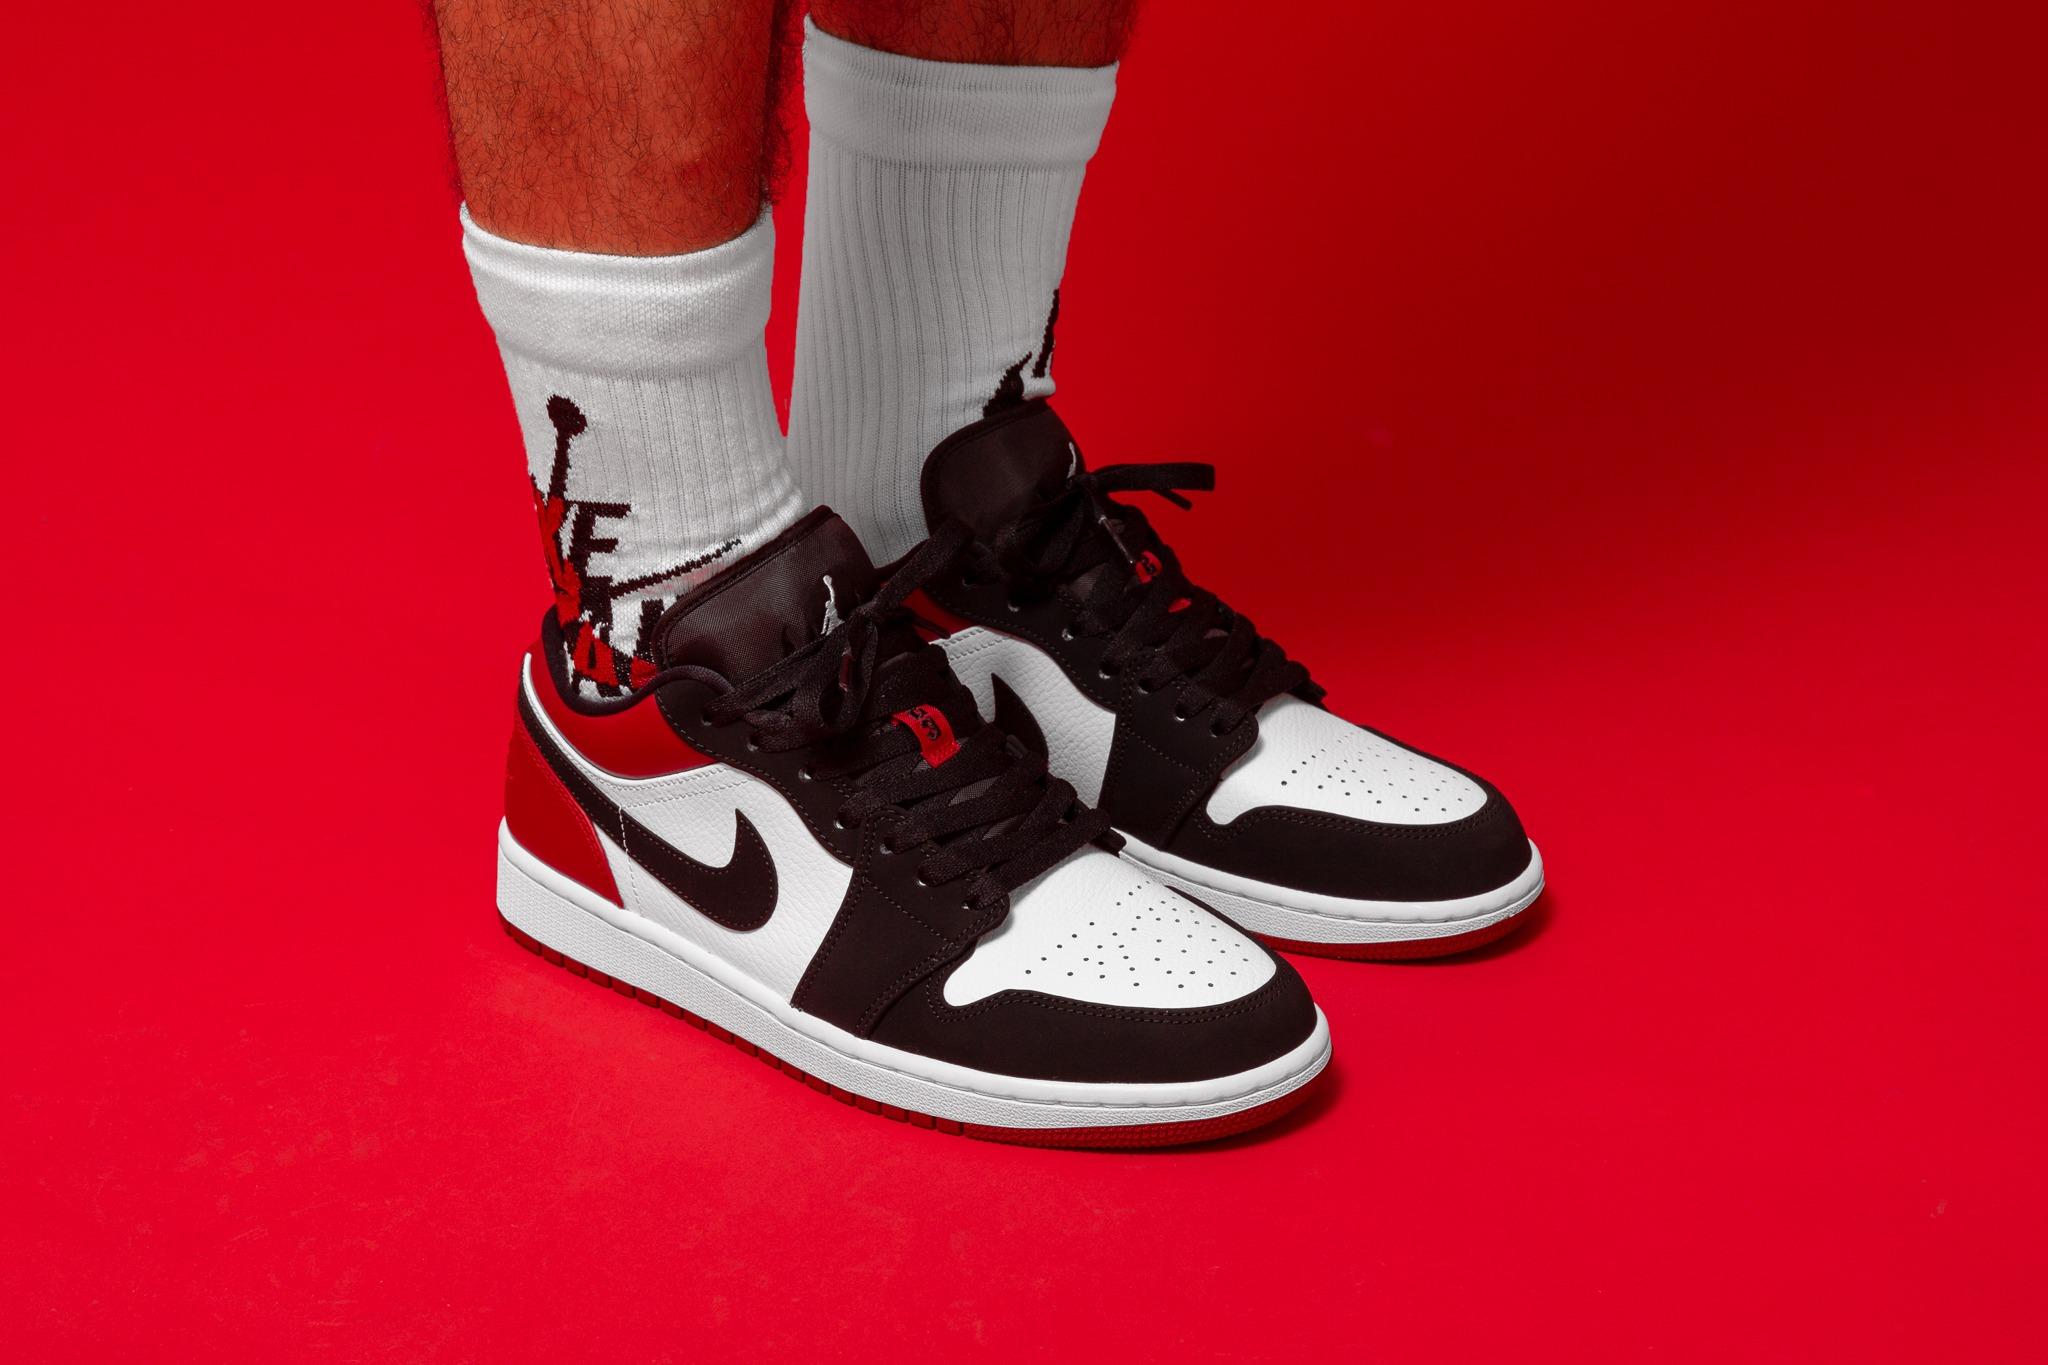 Air Jordan 1 Low in White/Black-Gym Red